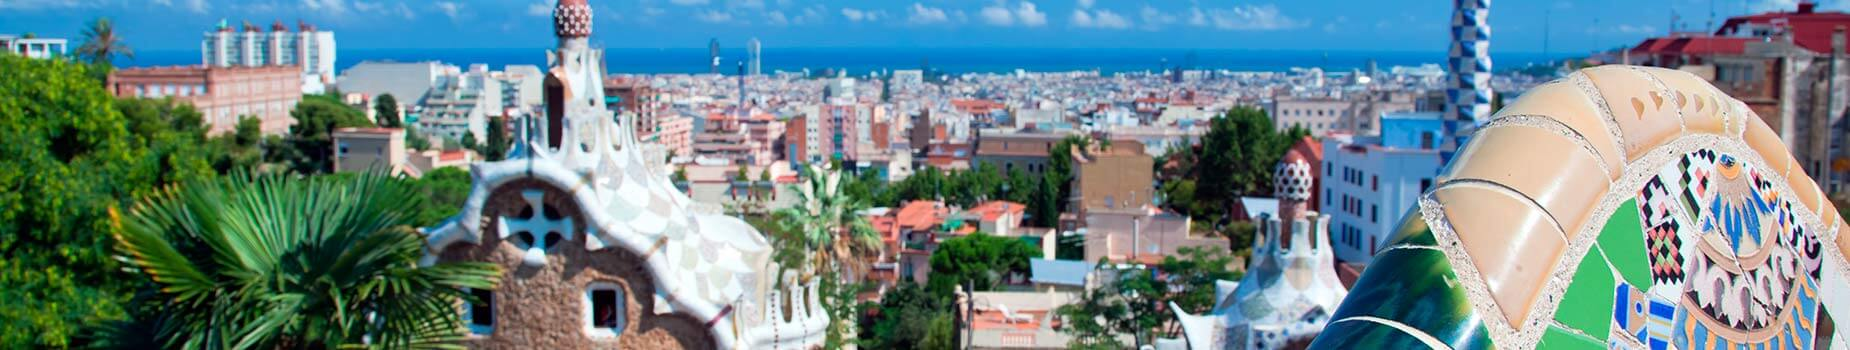 Fly Drive Barcelona